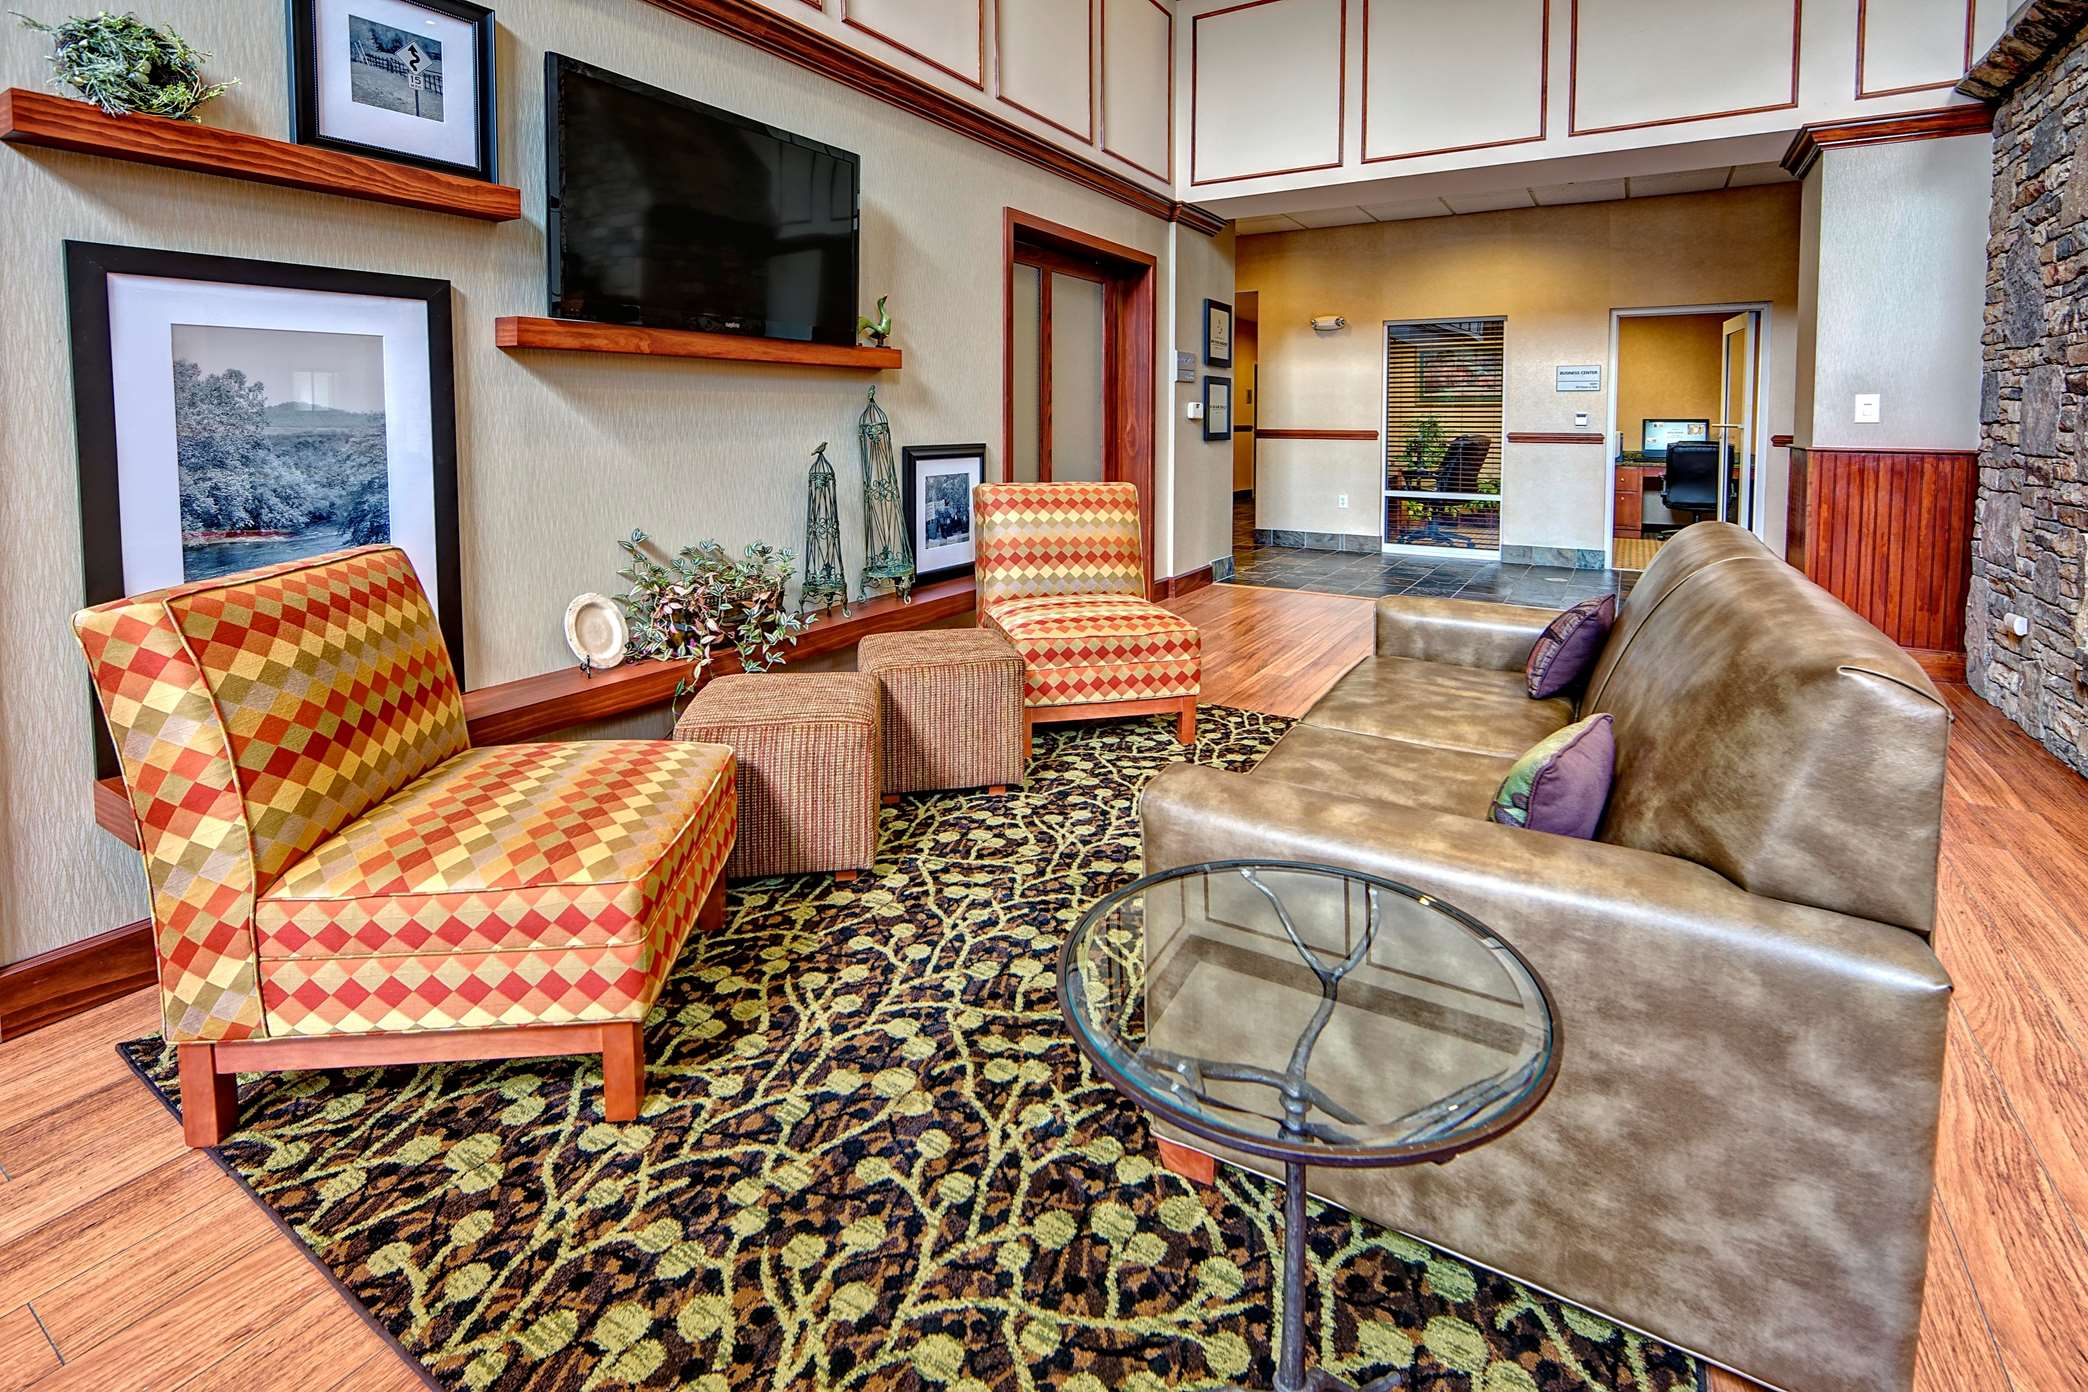 Hampton Inn & Suites Cashiers-Sapphire Valley image 18